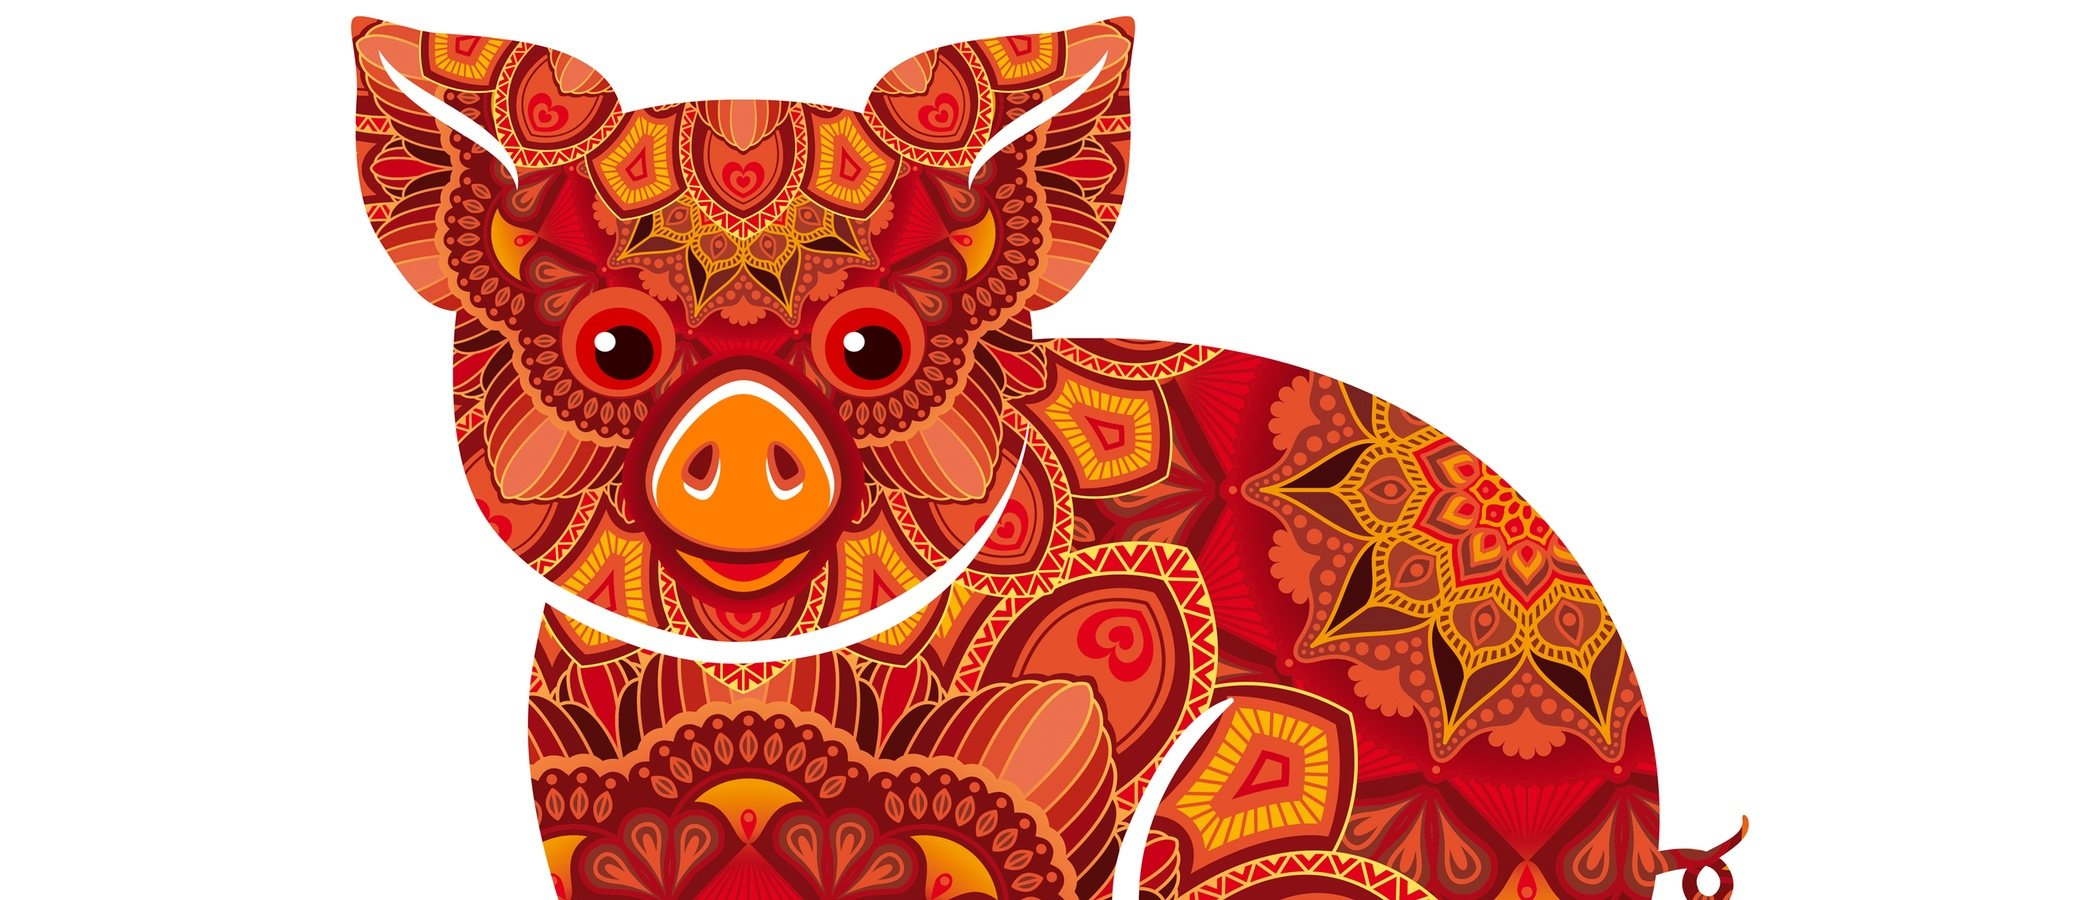 Horóscopo chino 2019: Cerdo